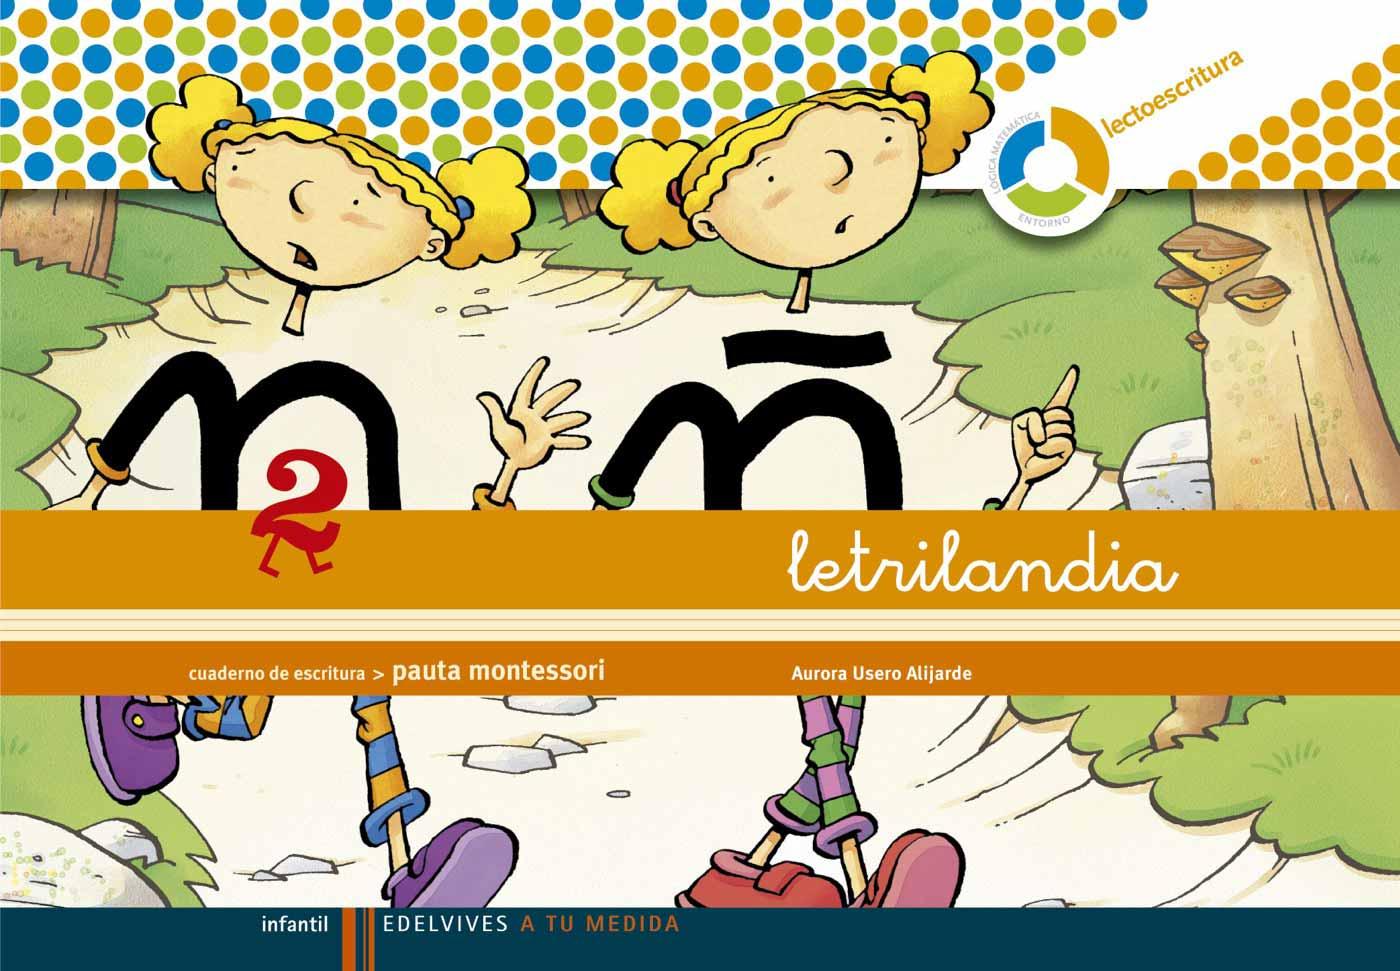 Letrilandia Escritura Espiral Pauta Montessori 2 - Vv.aa.